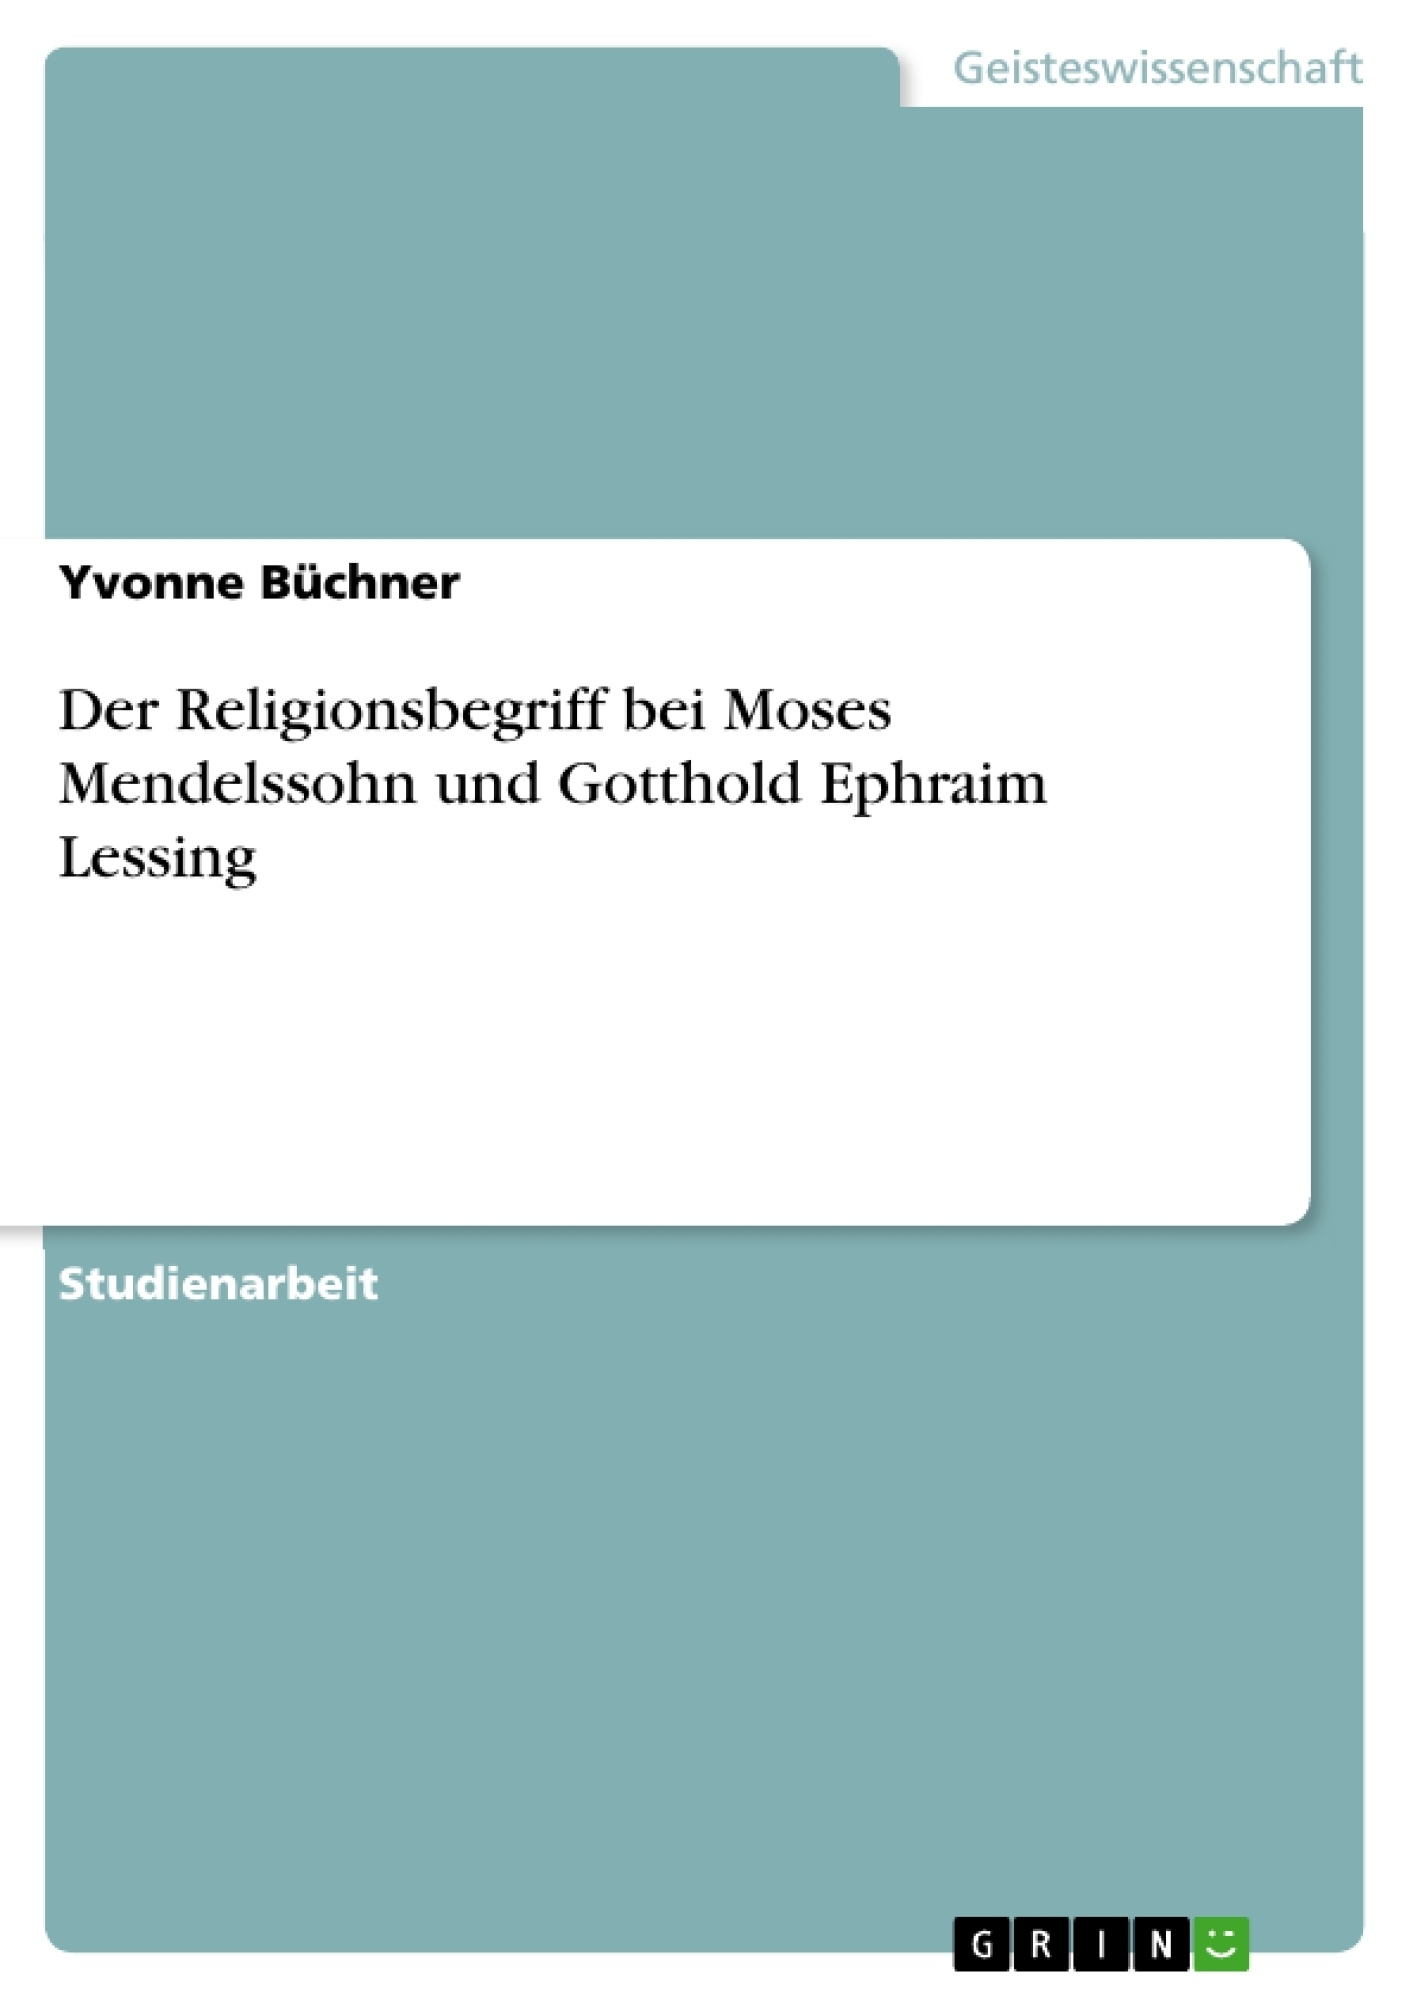 Titel: Der Religionsbegriff bei Moses Mendelssohn und Gotthold Ephraim Lessing